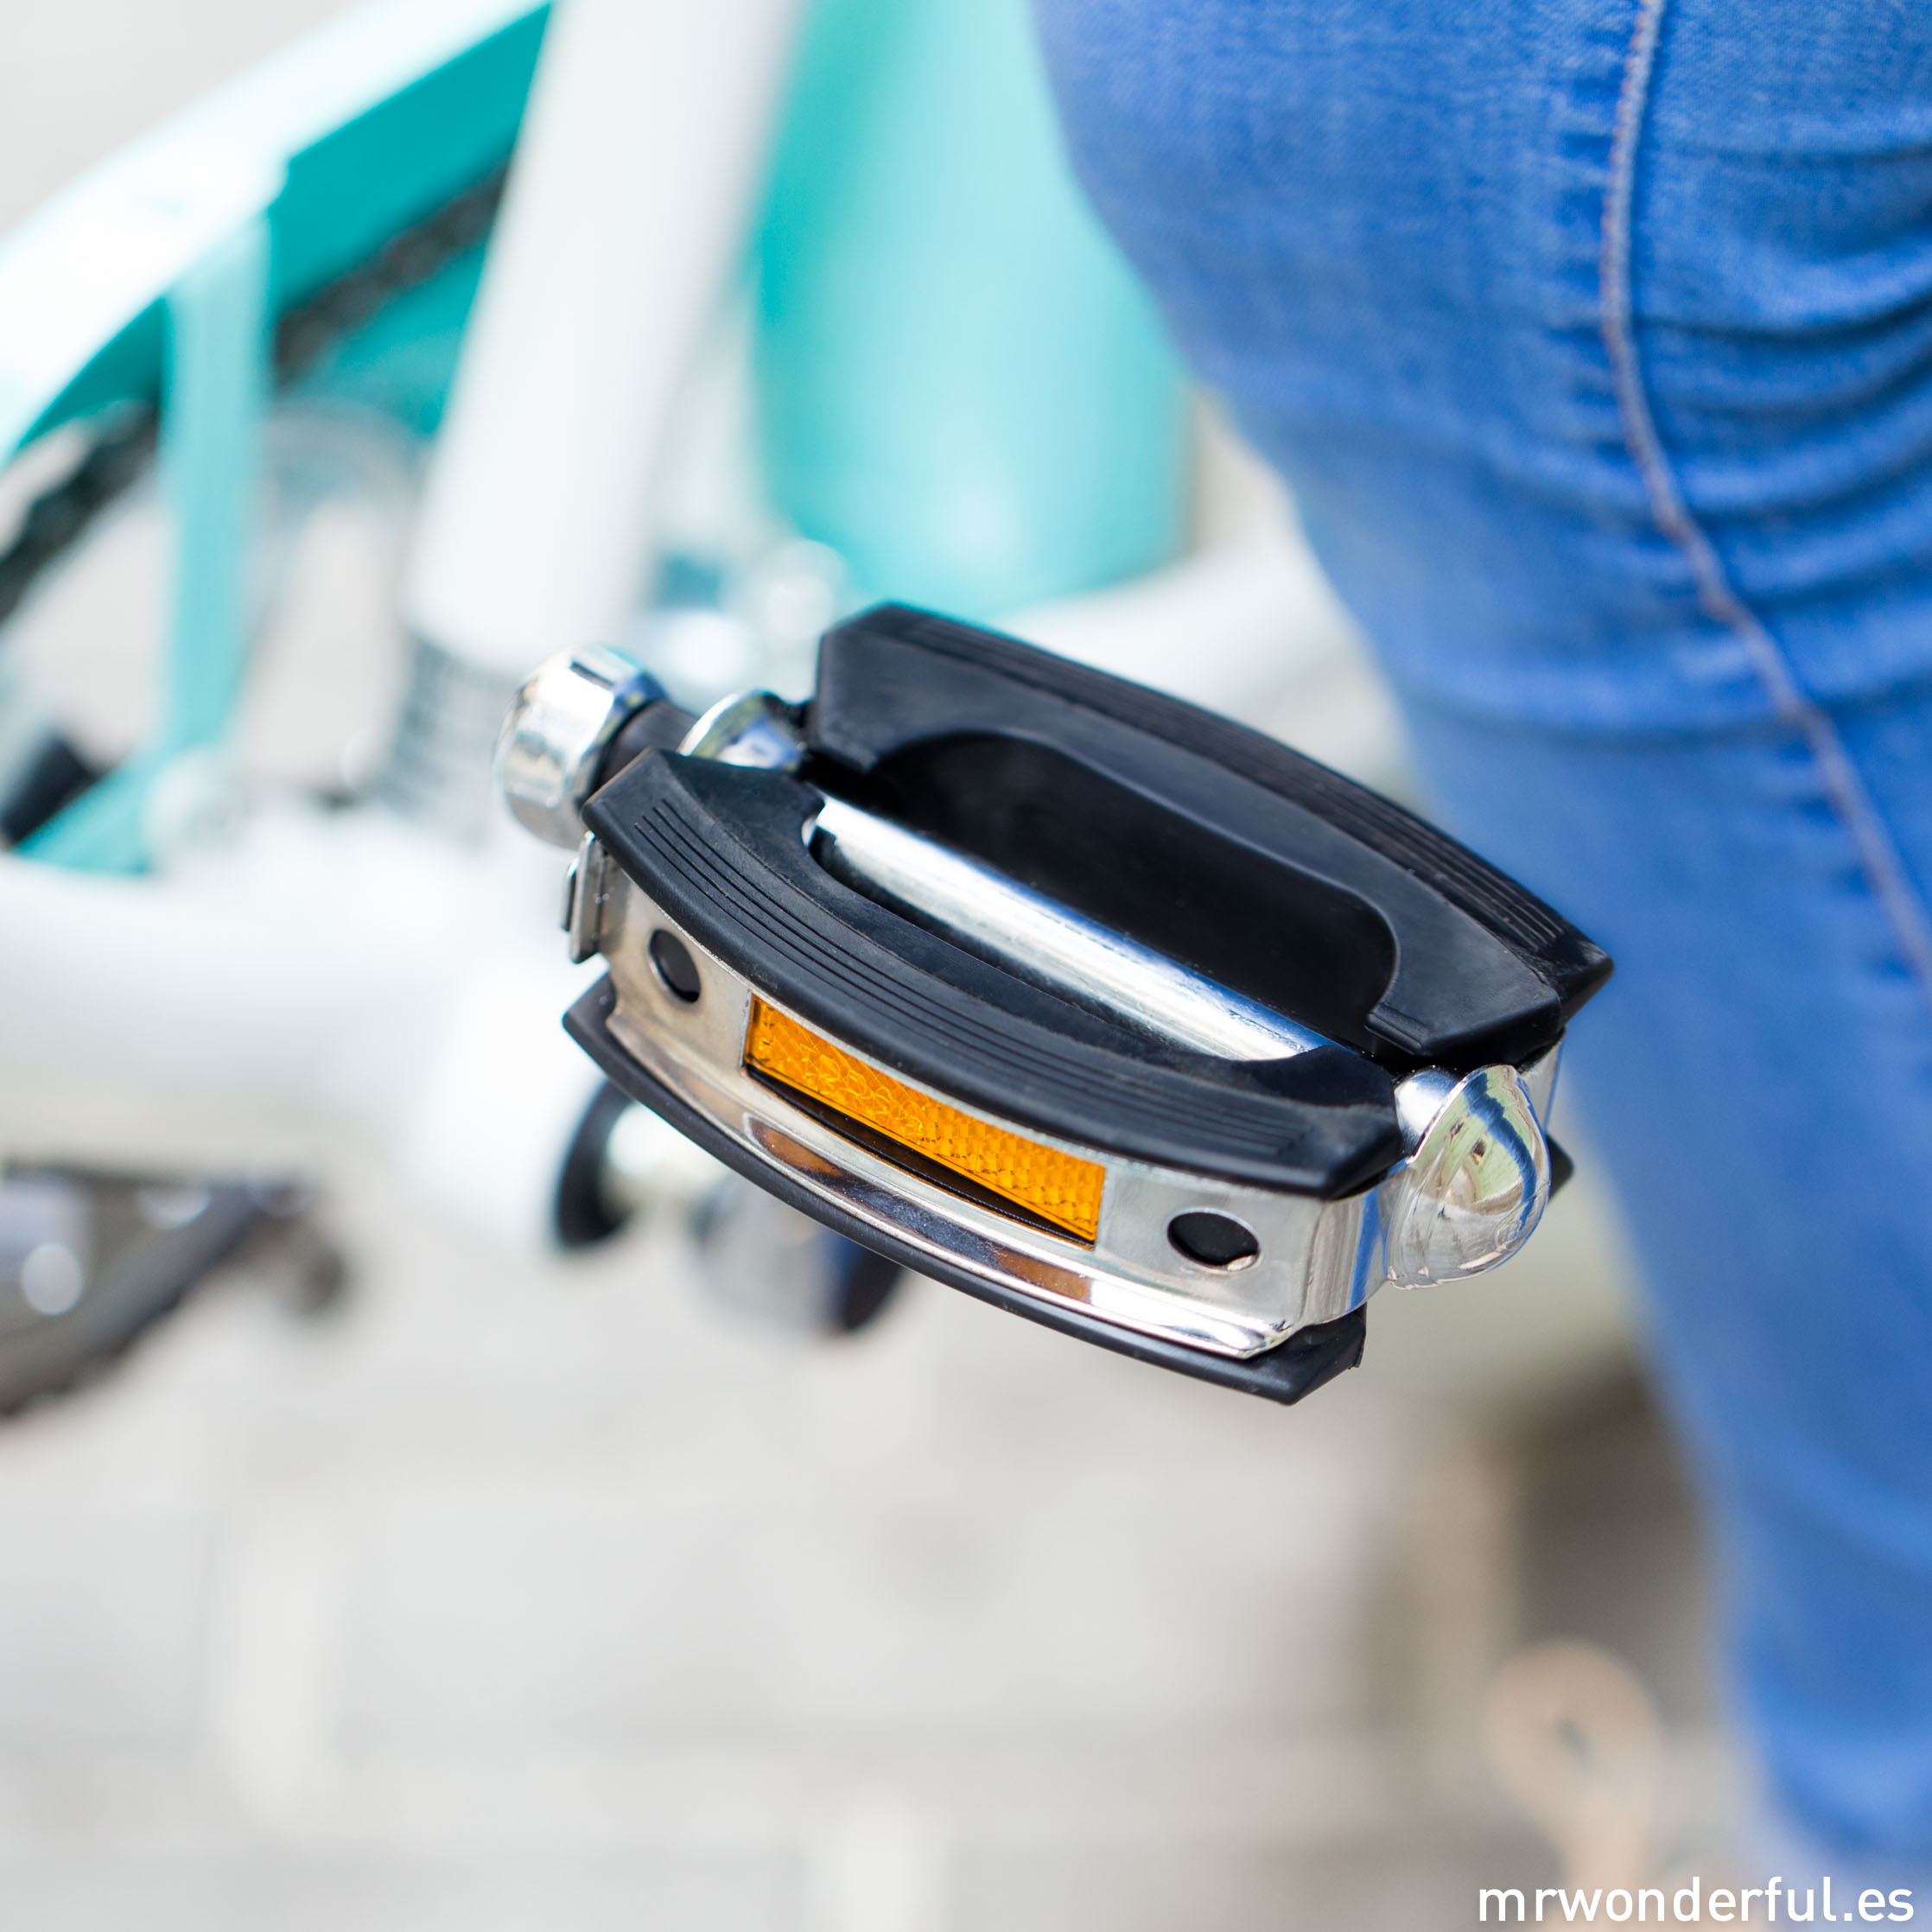 mrwonderful_concurso-bicicleta-41-Editar